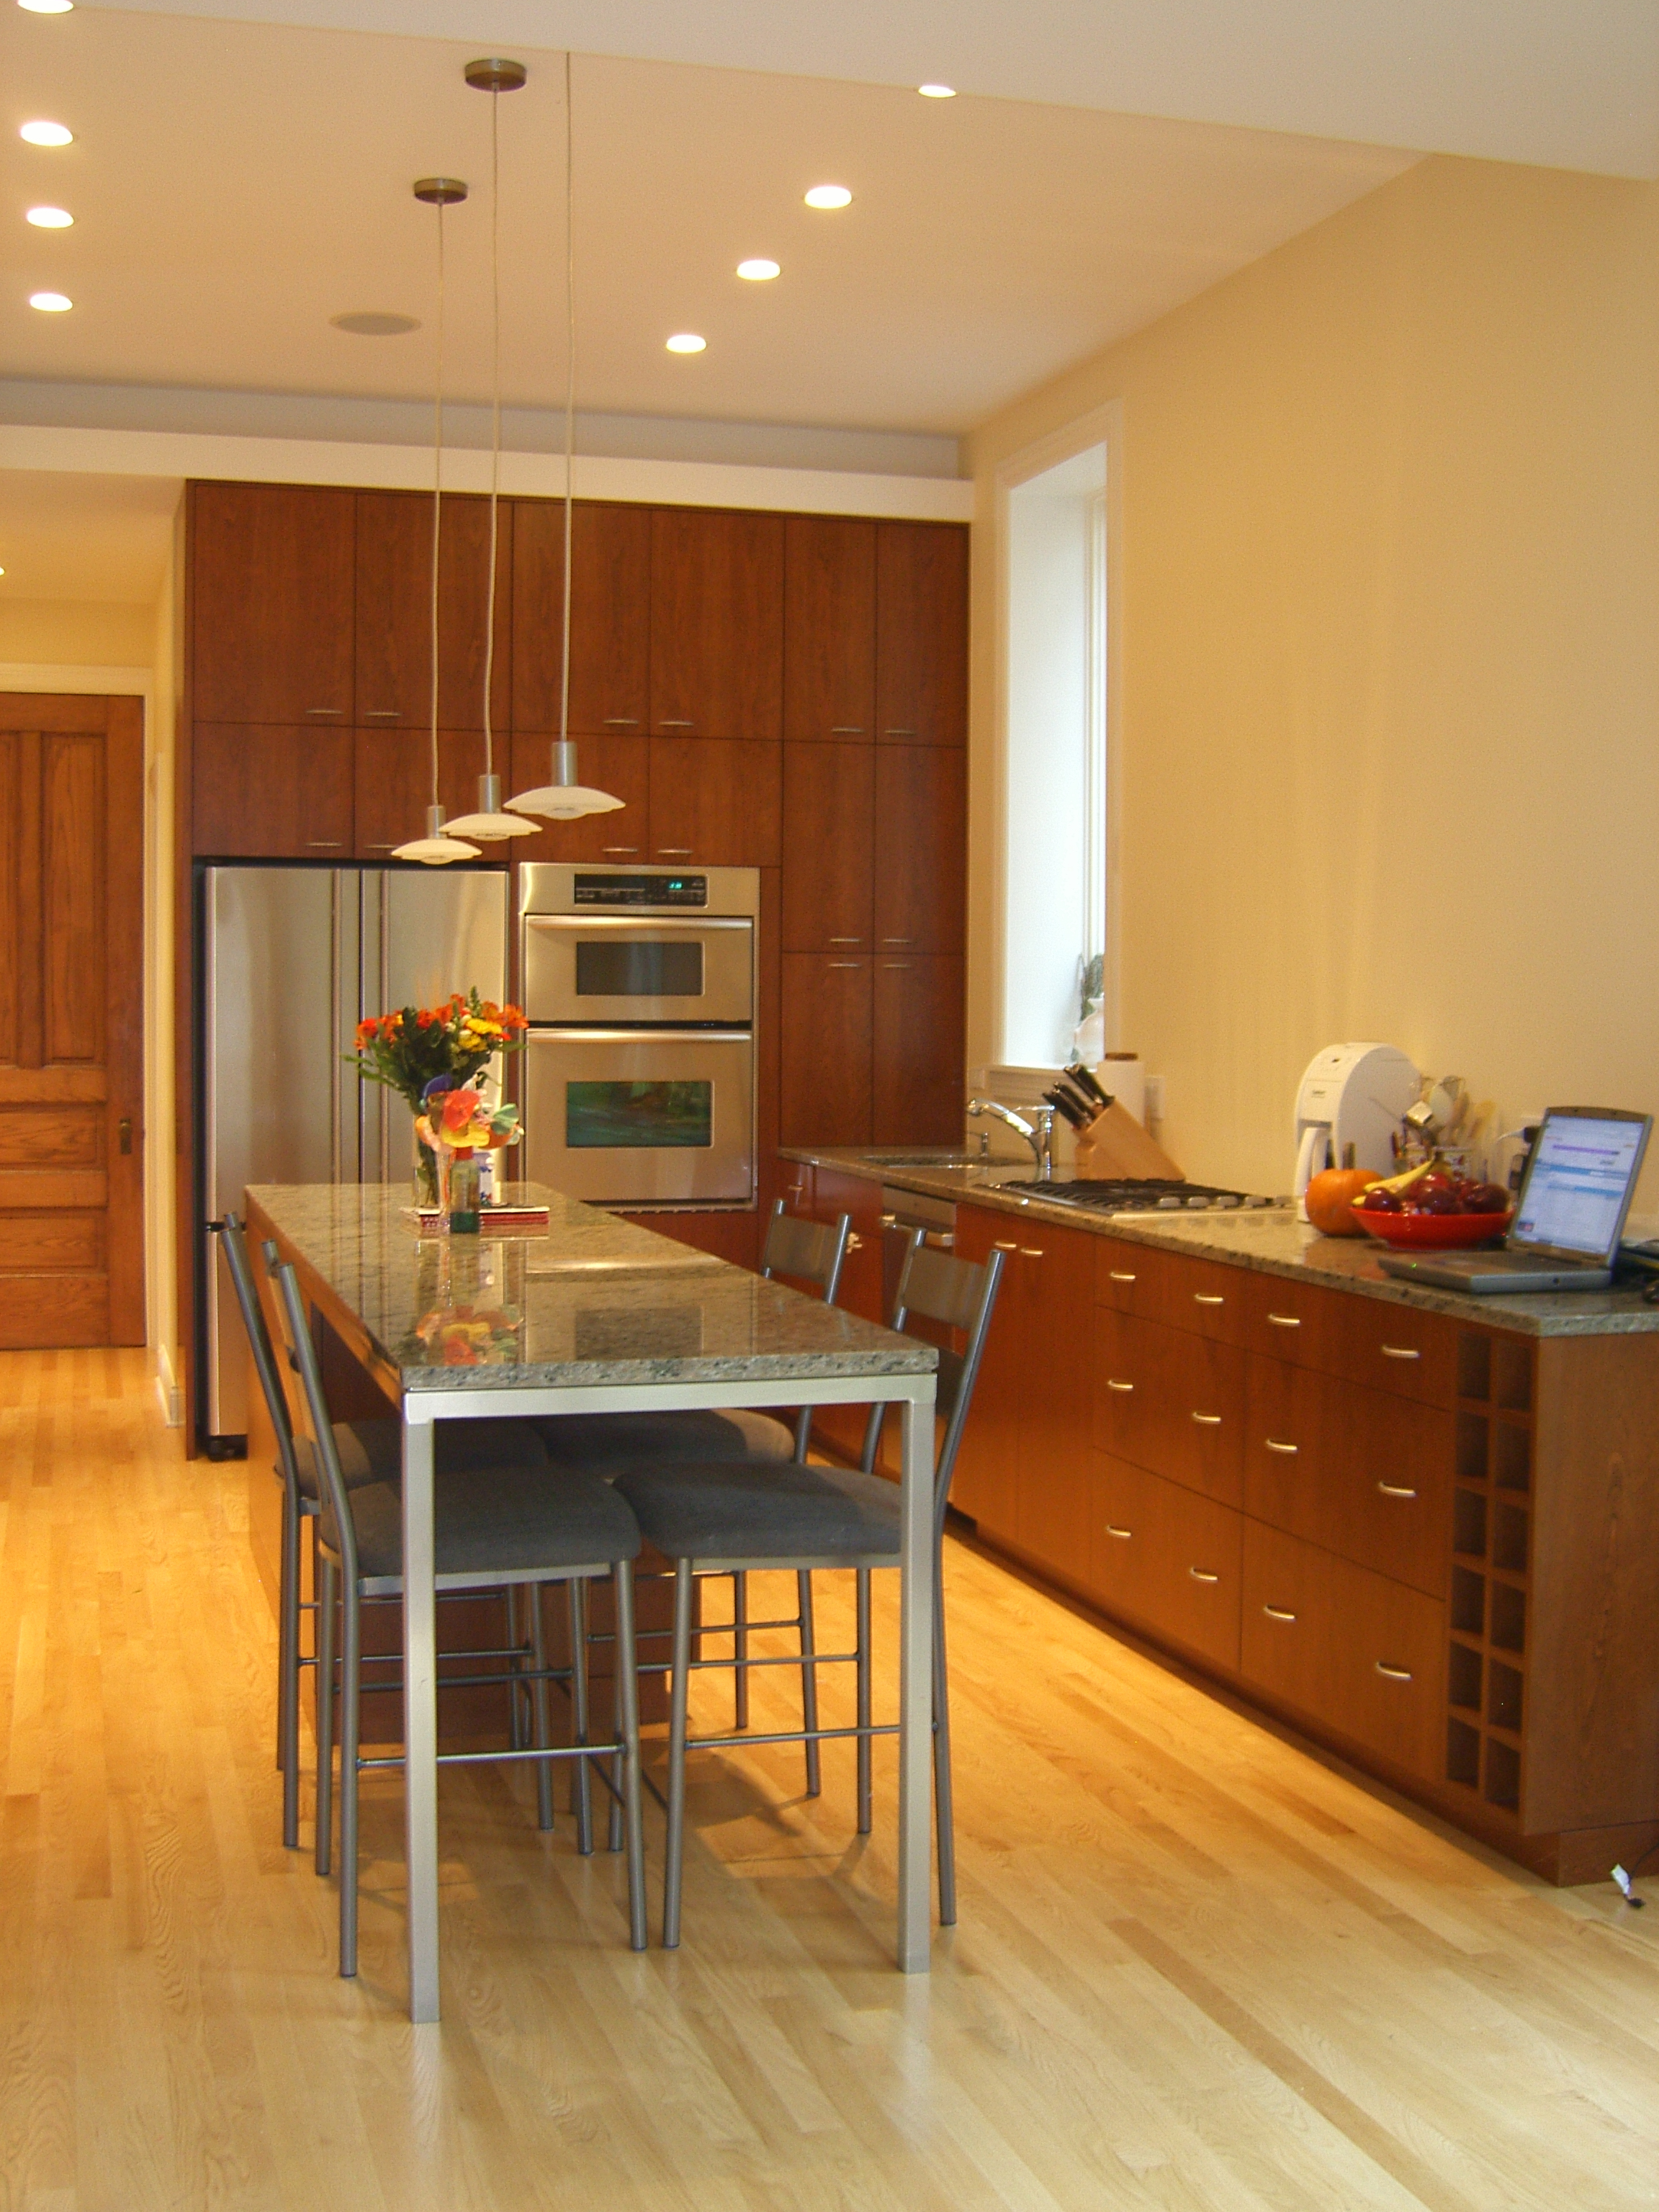 Fullerton_Parkway_Residence_Interior_Kitchen_View_South.jpg